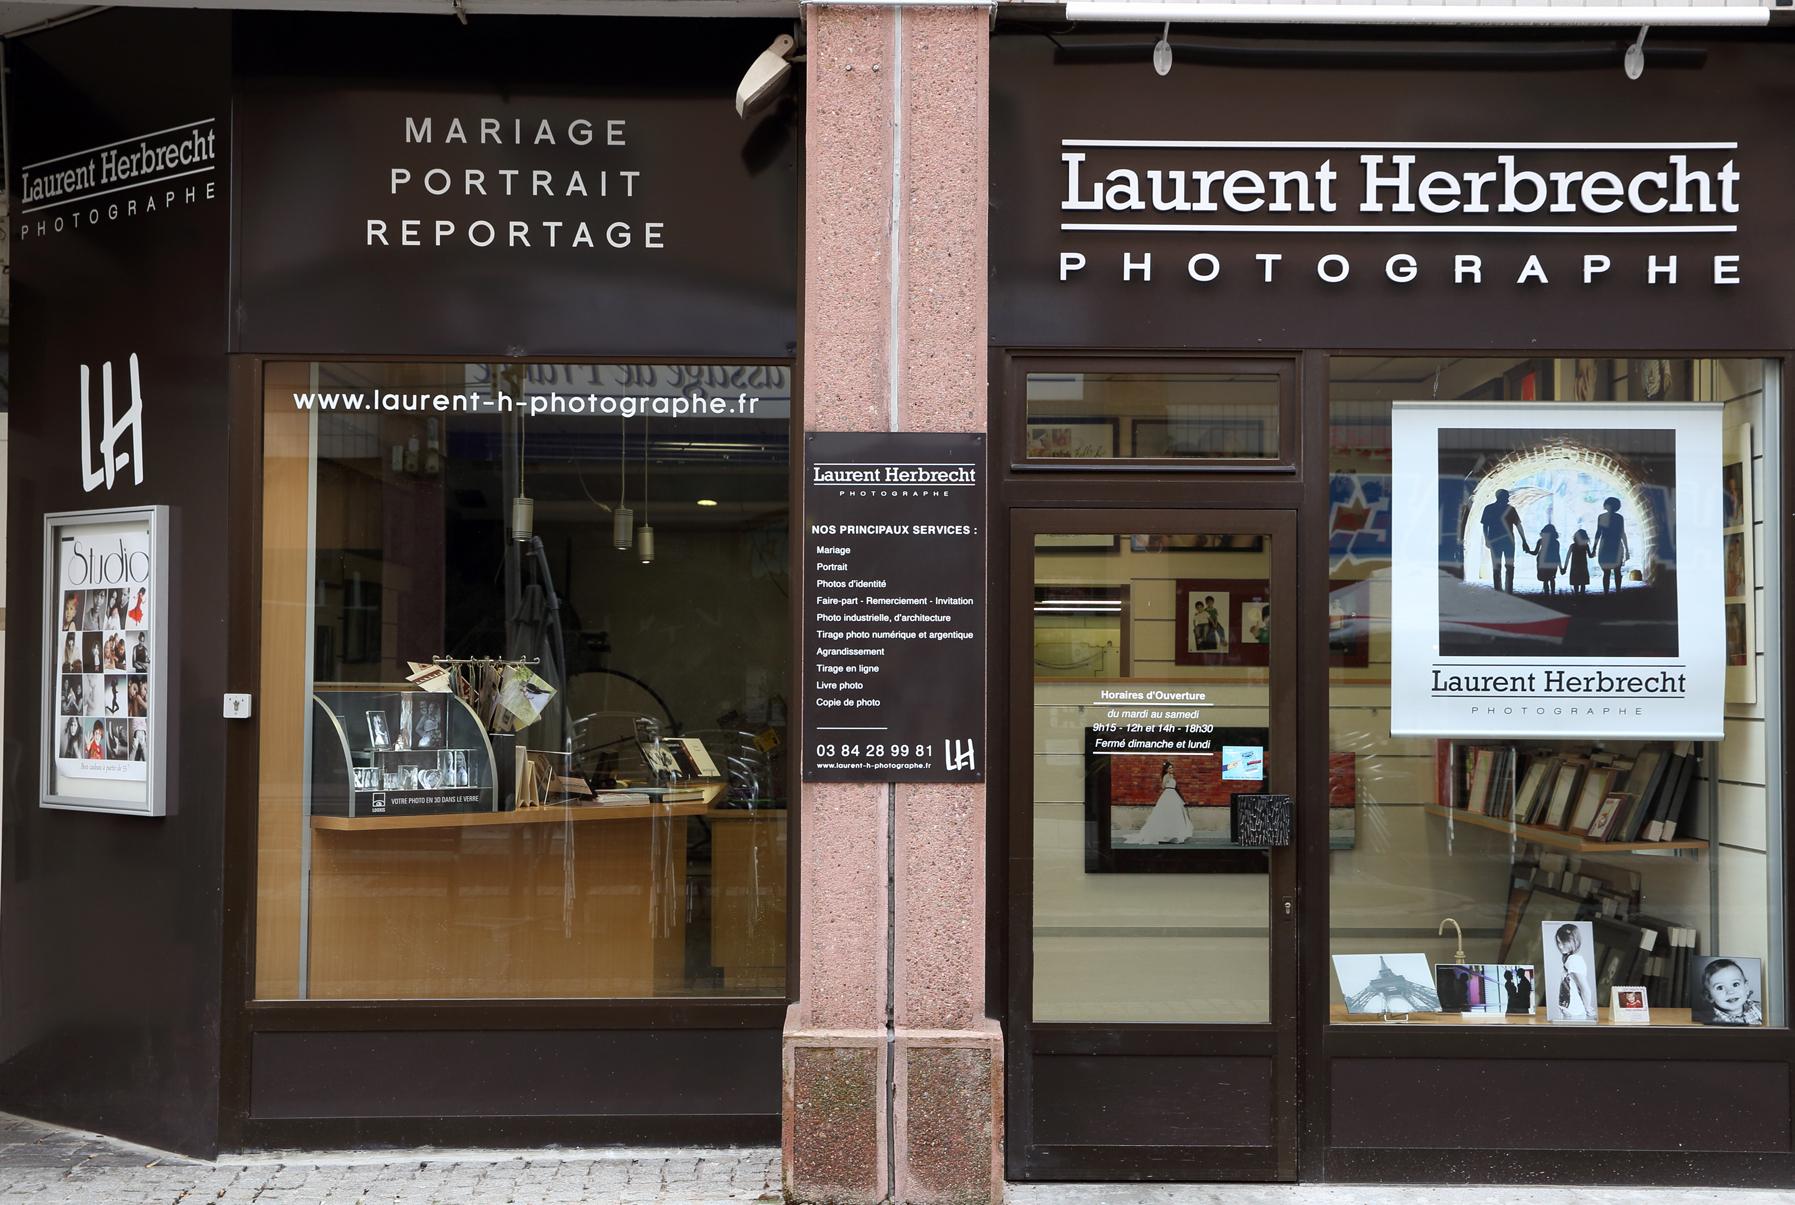 Galerie d'image - LAURENT HERBRECHT PHOTOGRAPHE